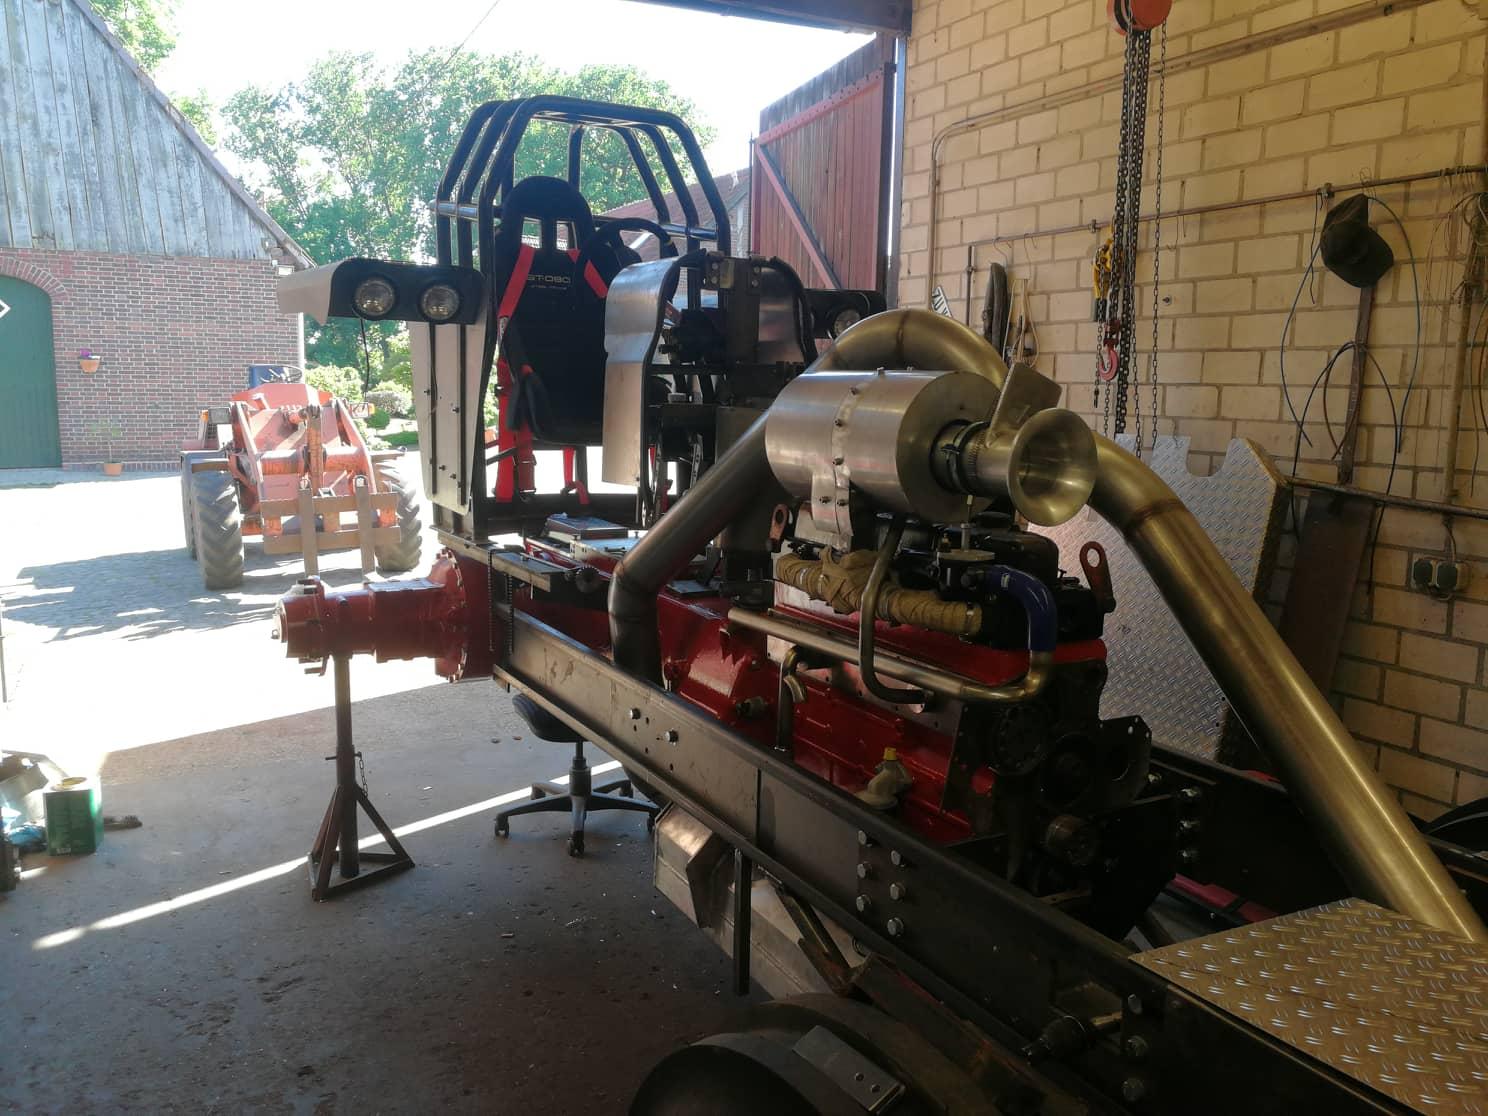 Tractor Pulling News - Pullingworld com: New Case IH Farm